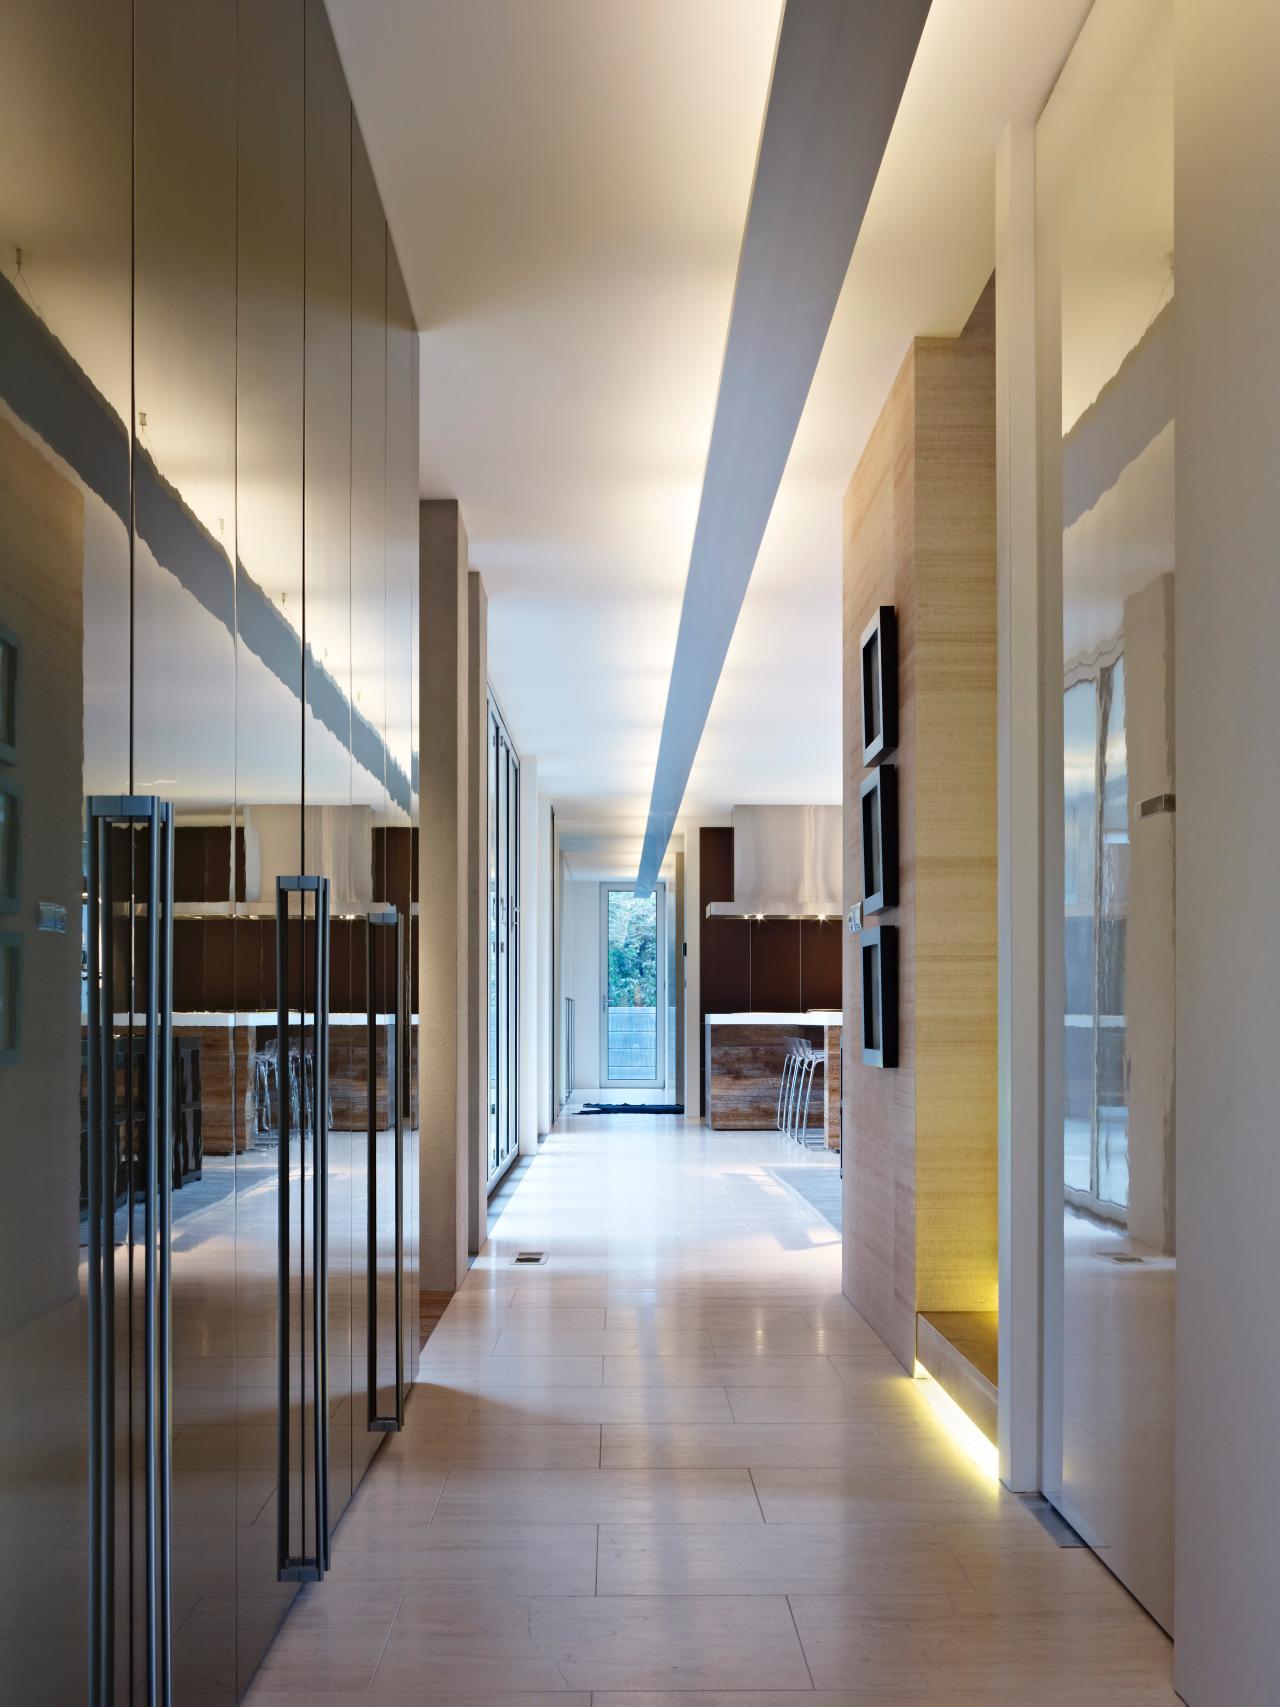 dp_karlusic-hallway-closets_s3x4-jpg-rend-hgtvcom-1280-1707